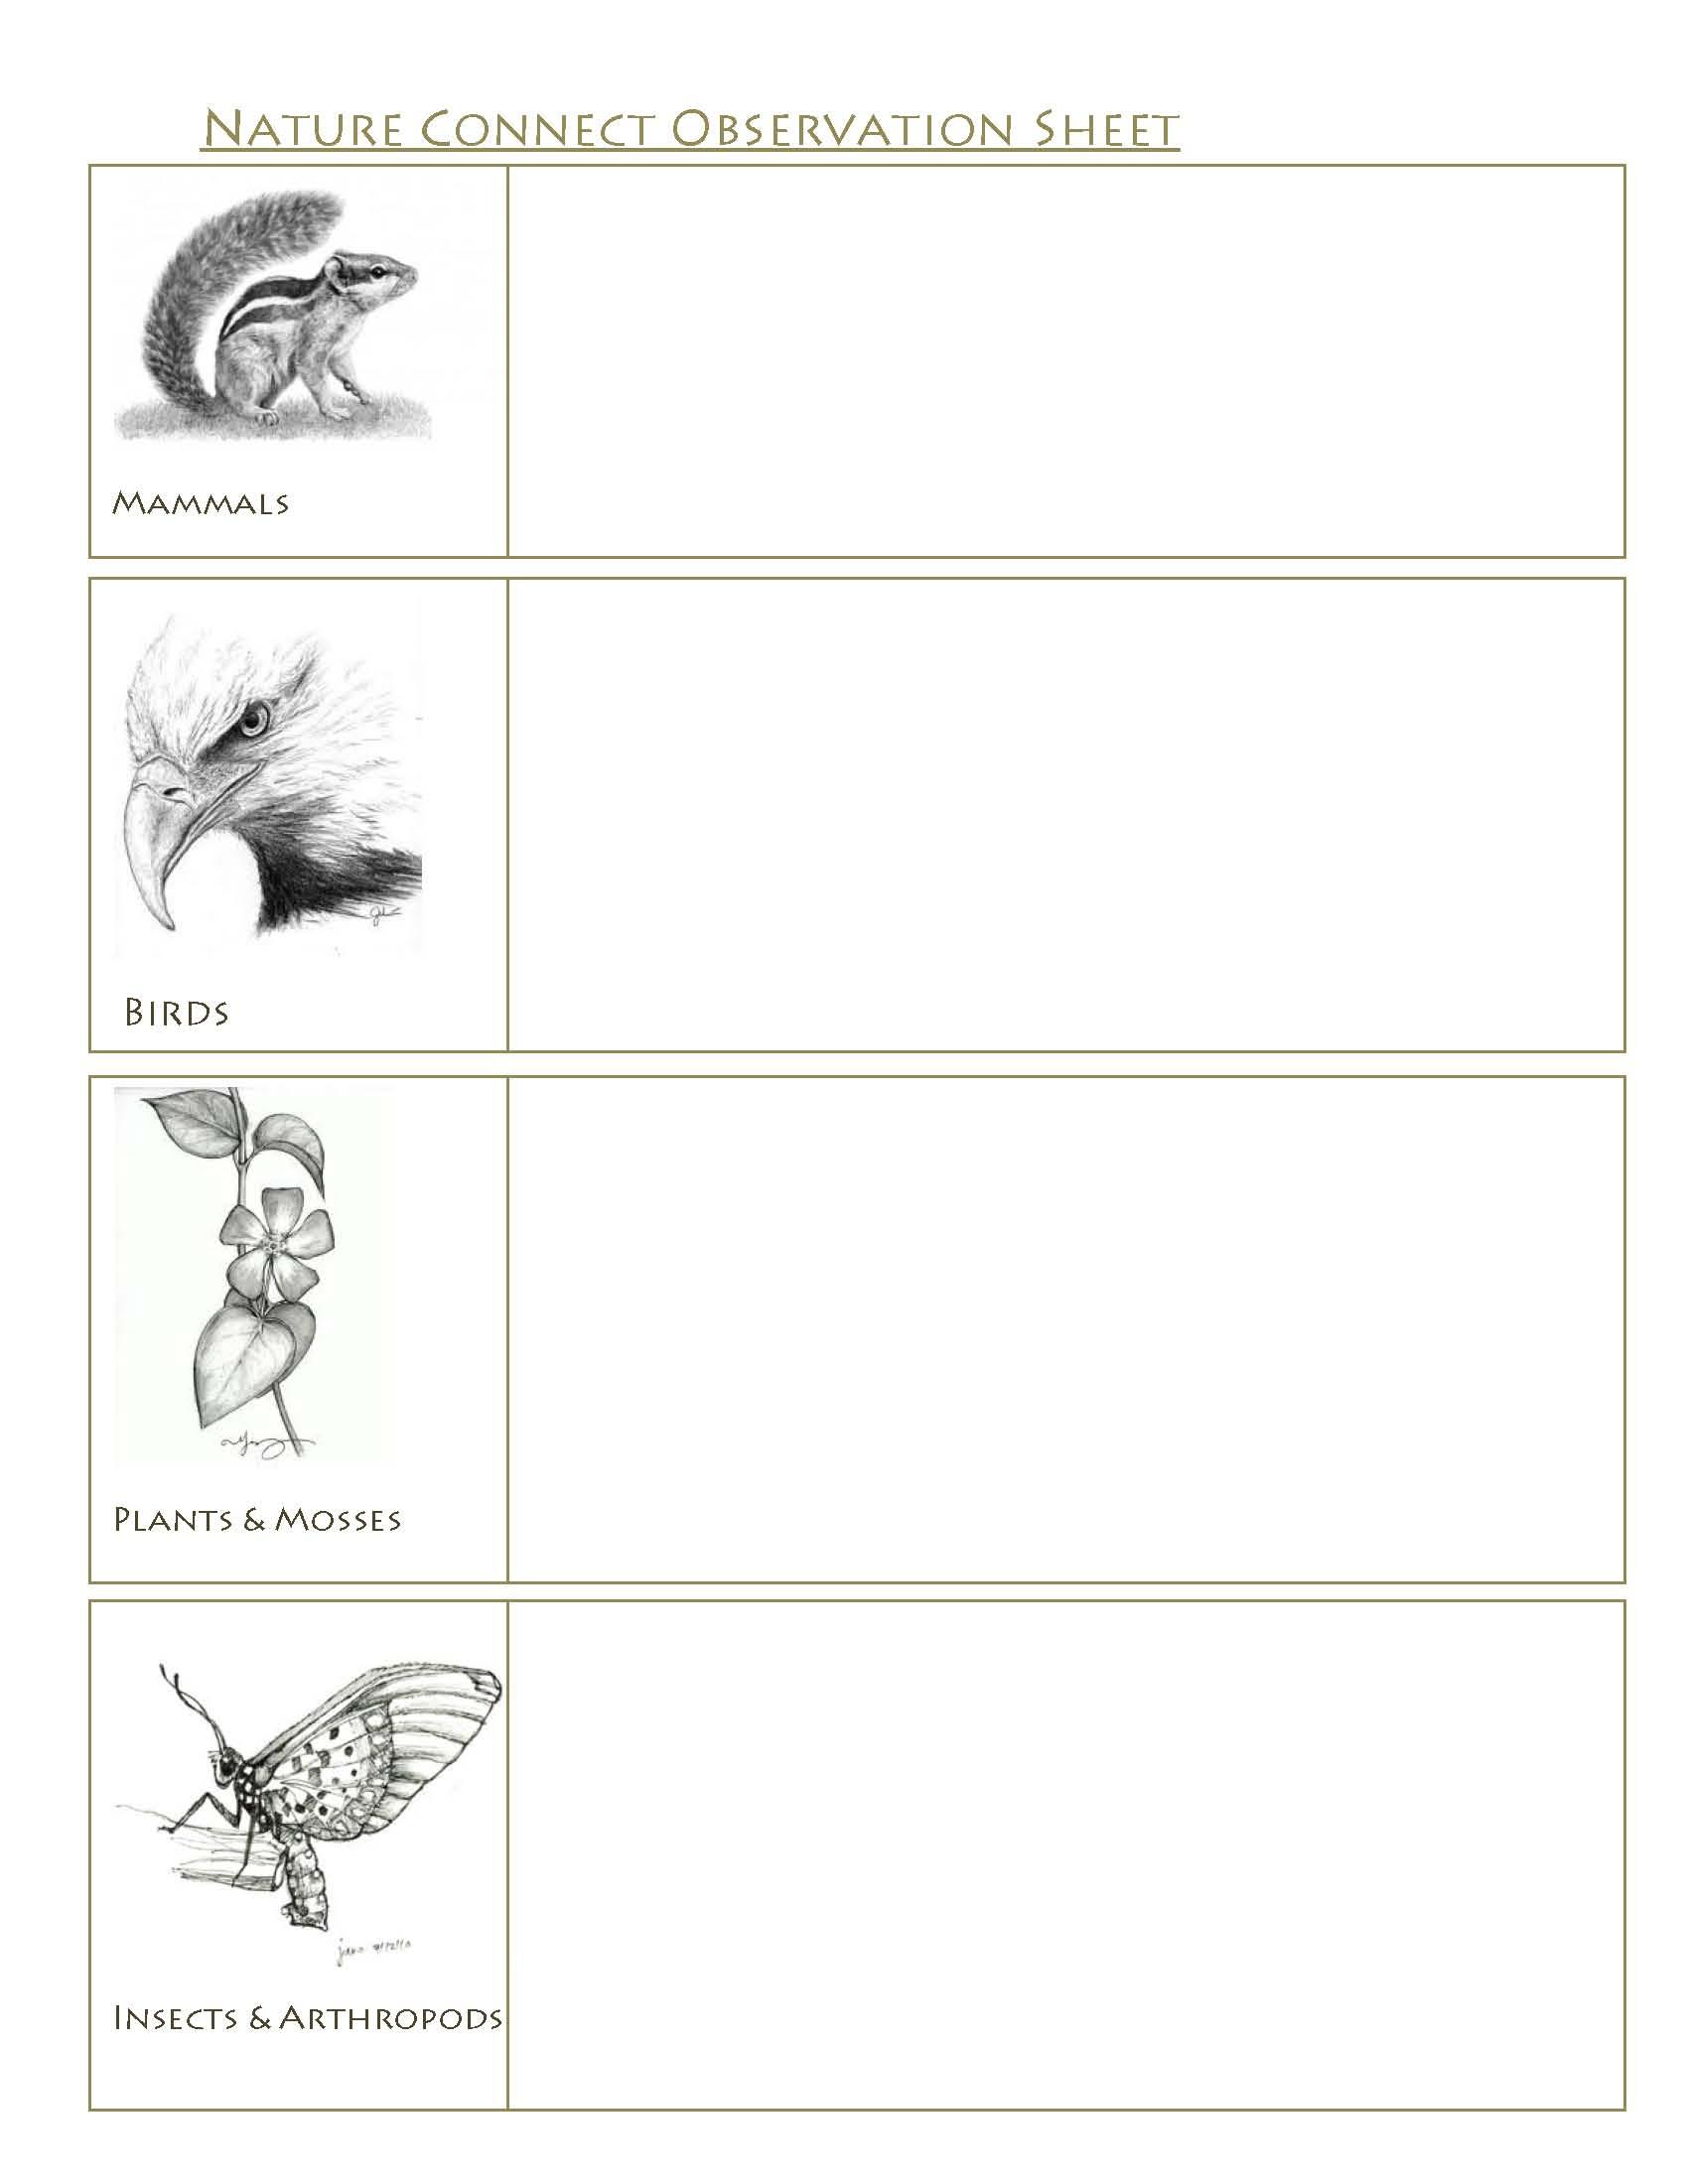 Wildlife Observation Work Sheet